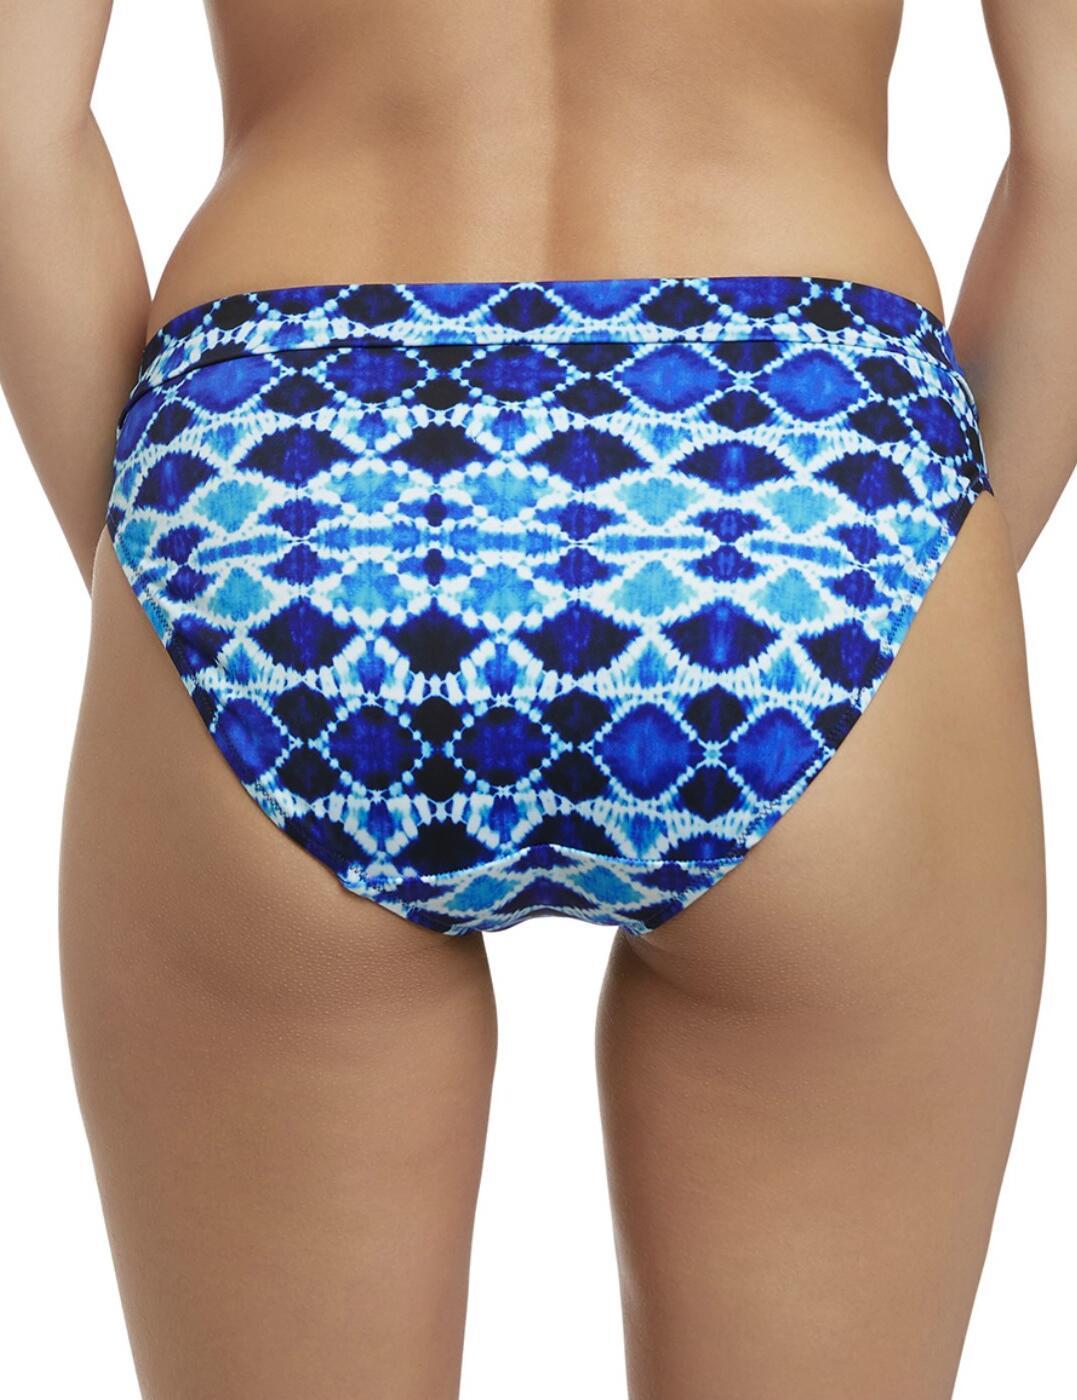 Fantasie-Tuscany-Classic-Twist-Brief-Bottoms-Pant-6518-New-Womens-Swimwear miniatura 3